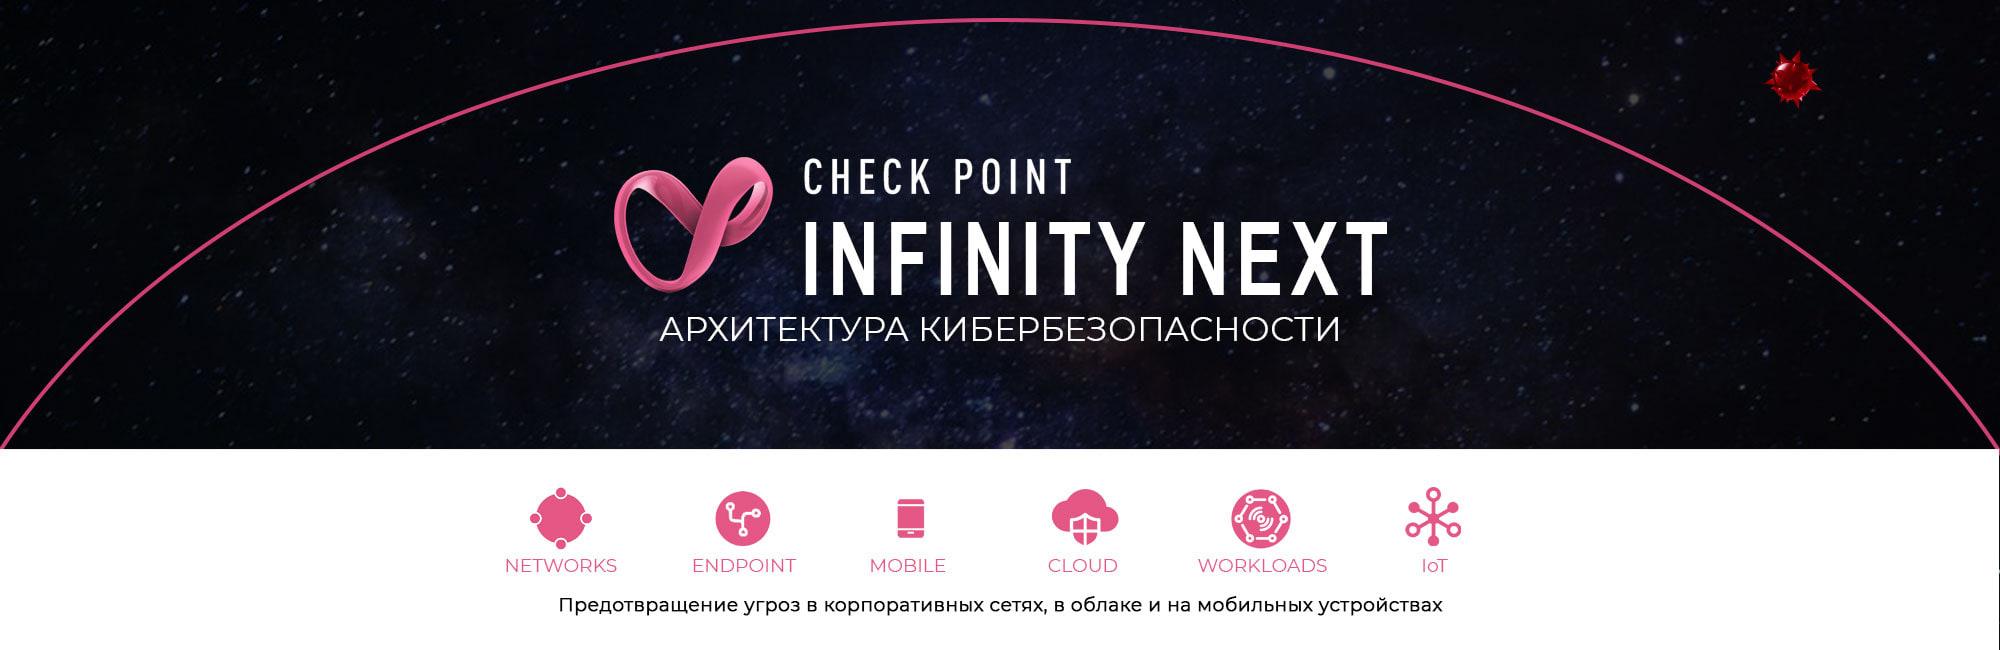 Check-Point-Infinity-Next—архитектура-кибербезопасности